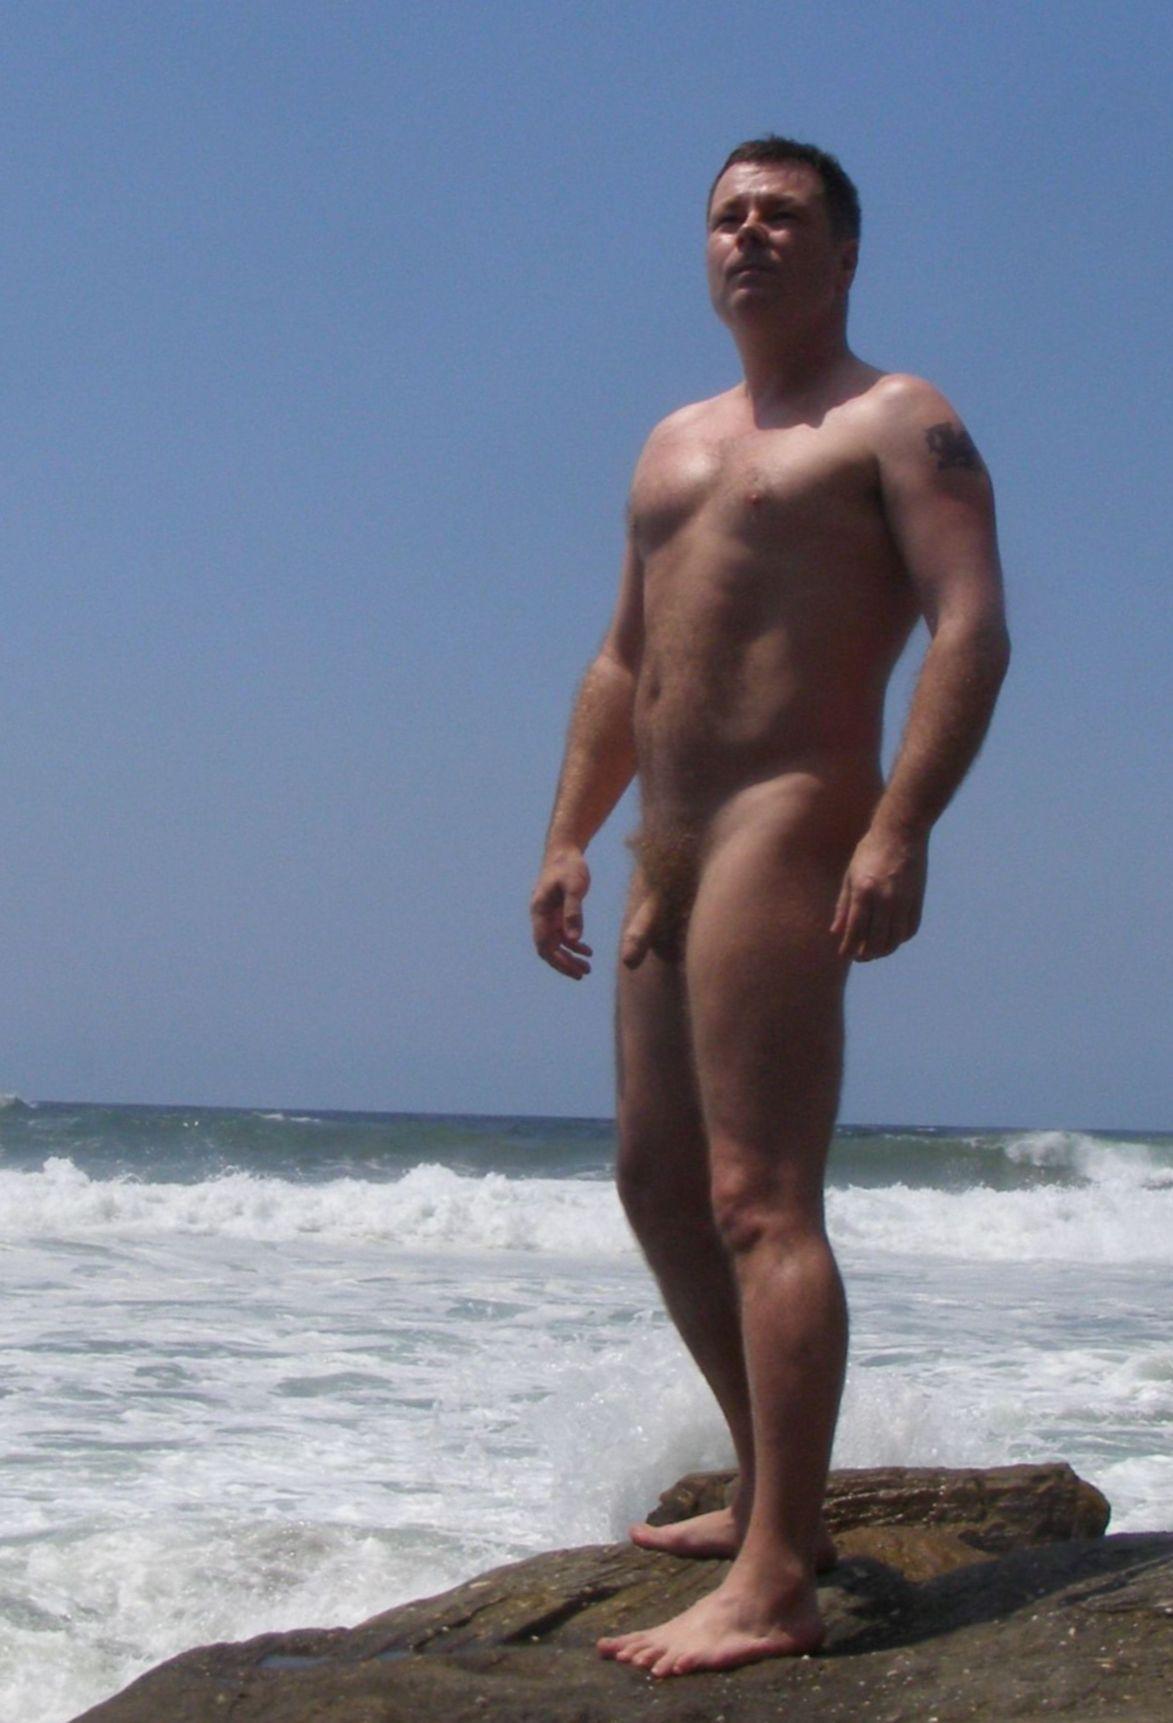 guyzbeach: follow guyzbeach, a collection of natural men naked at